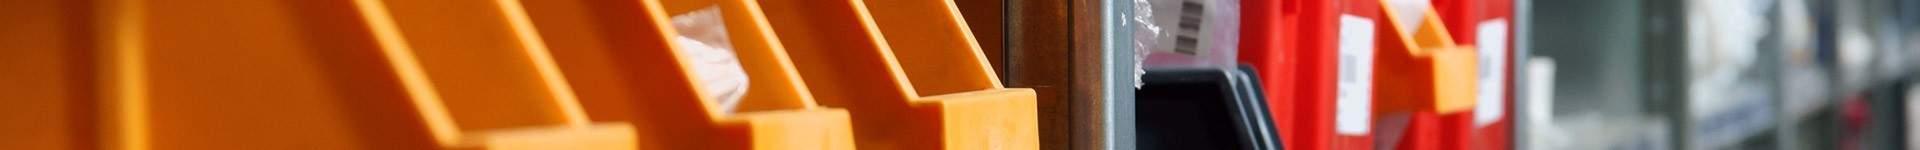 Rayonnage professionnel et manutention - Echamat Kernst